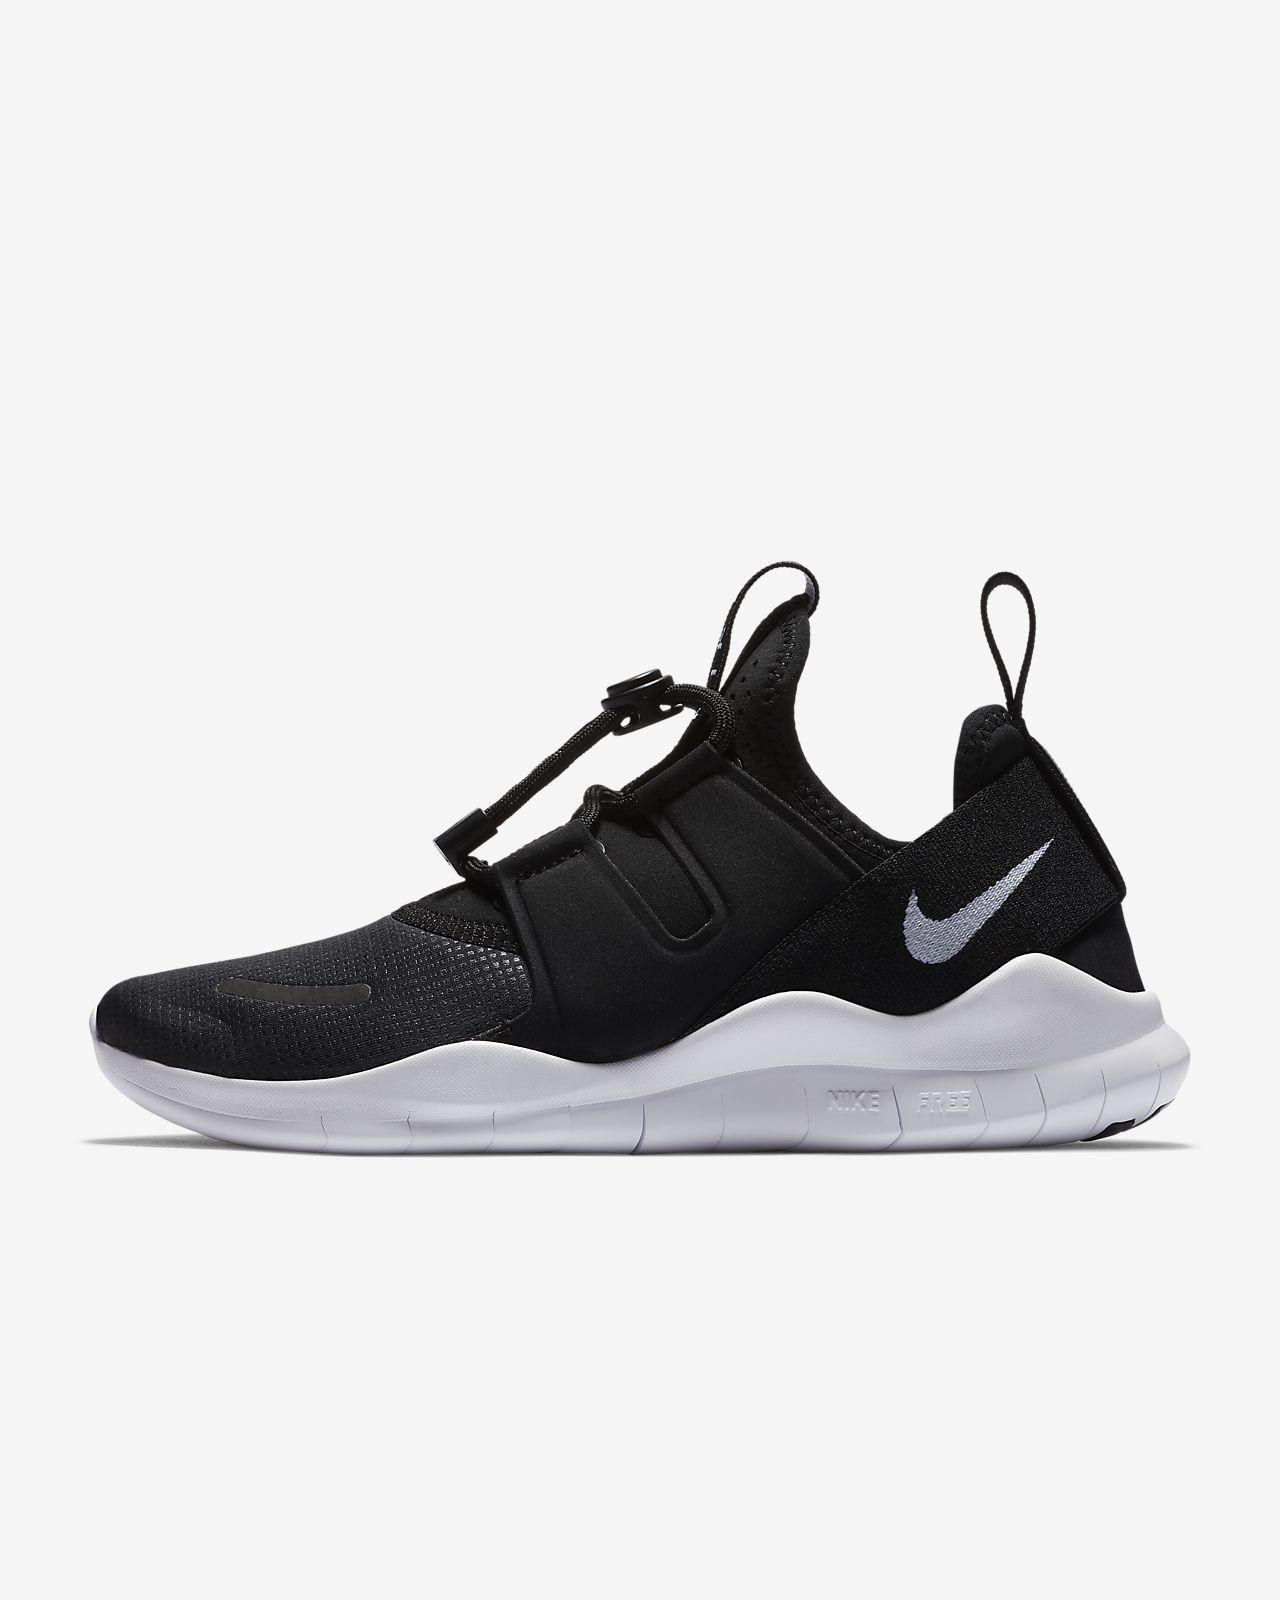 80aa53debcc Løbesko Til Dk Rn 2018 Free Nike Commuter Kvinder ICf8qnw1